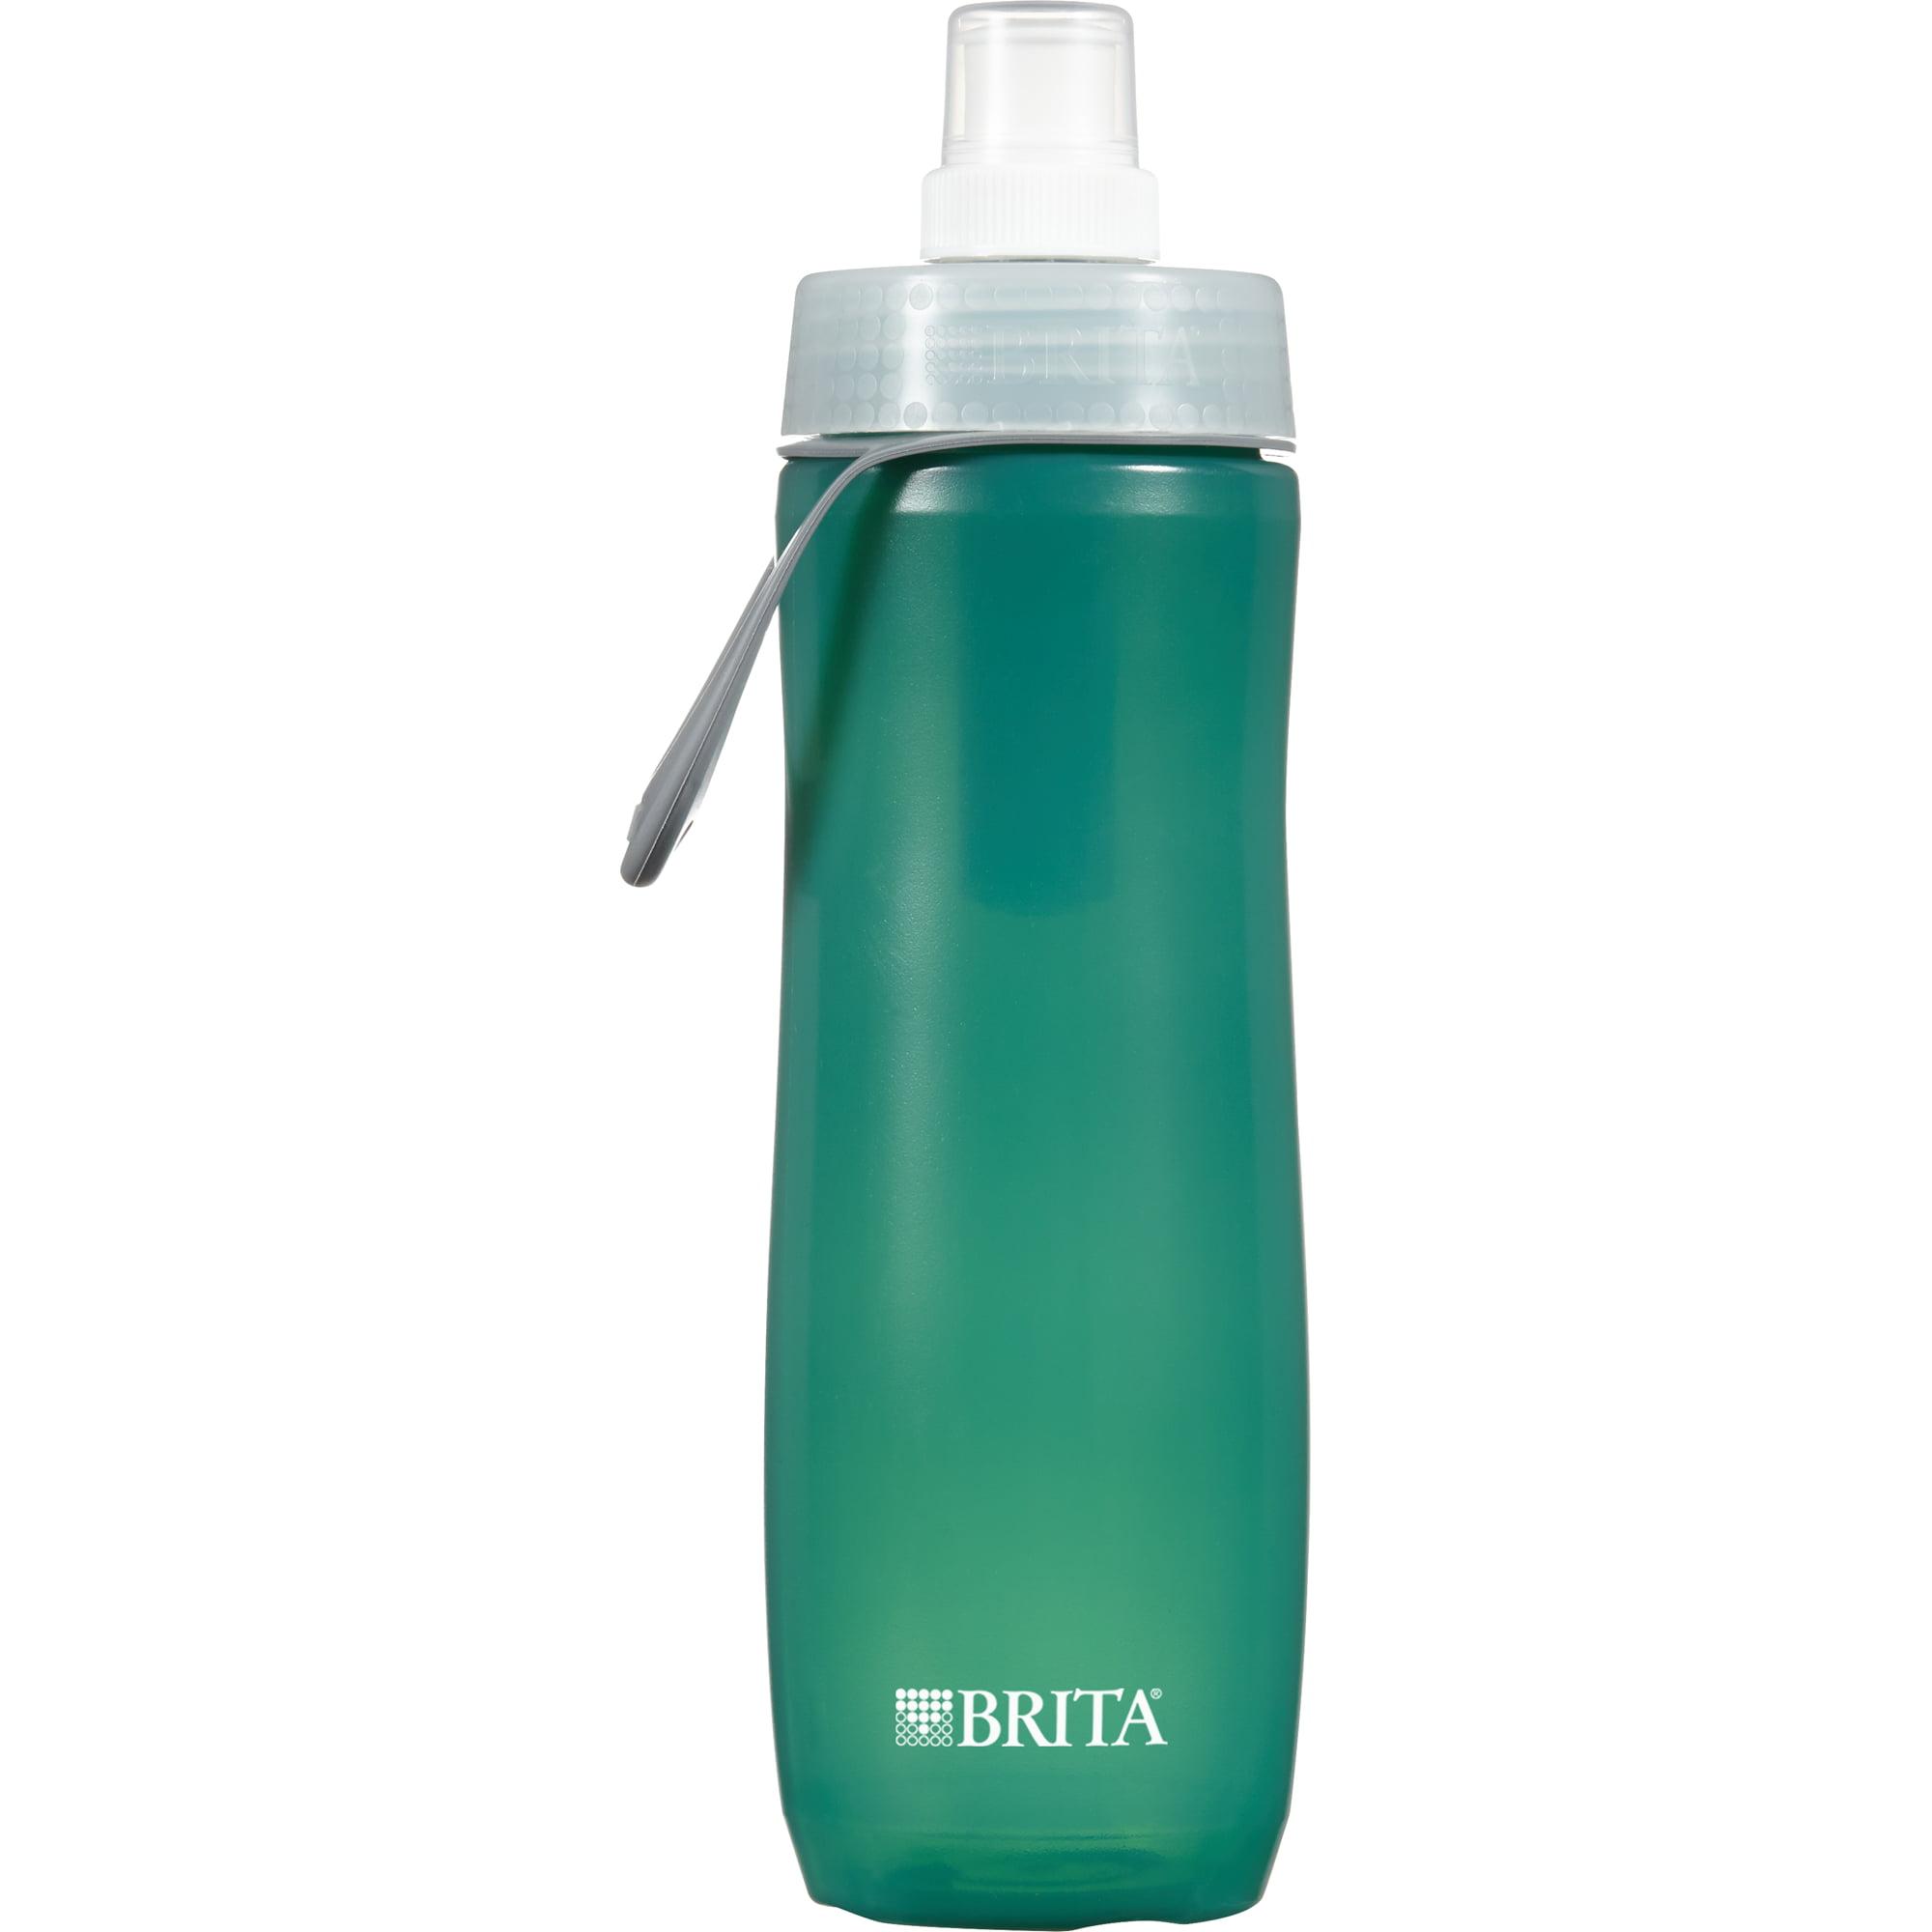 Brita Sport Water Filter Bottle Green Clorox Brita 35599